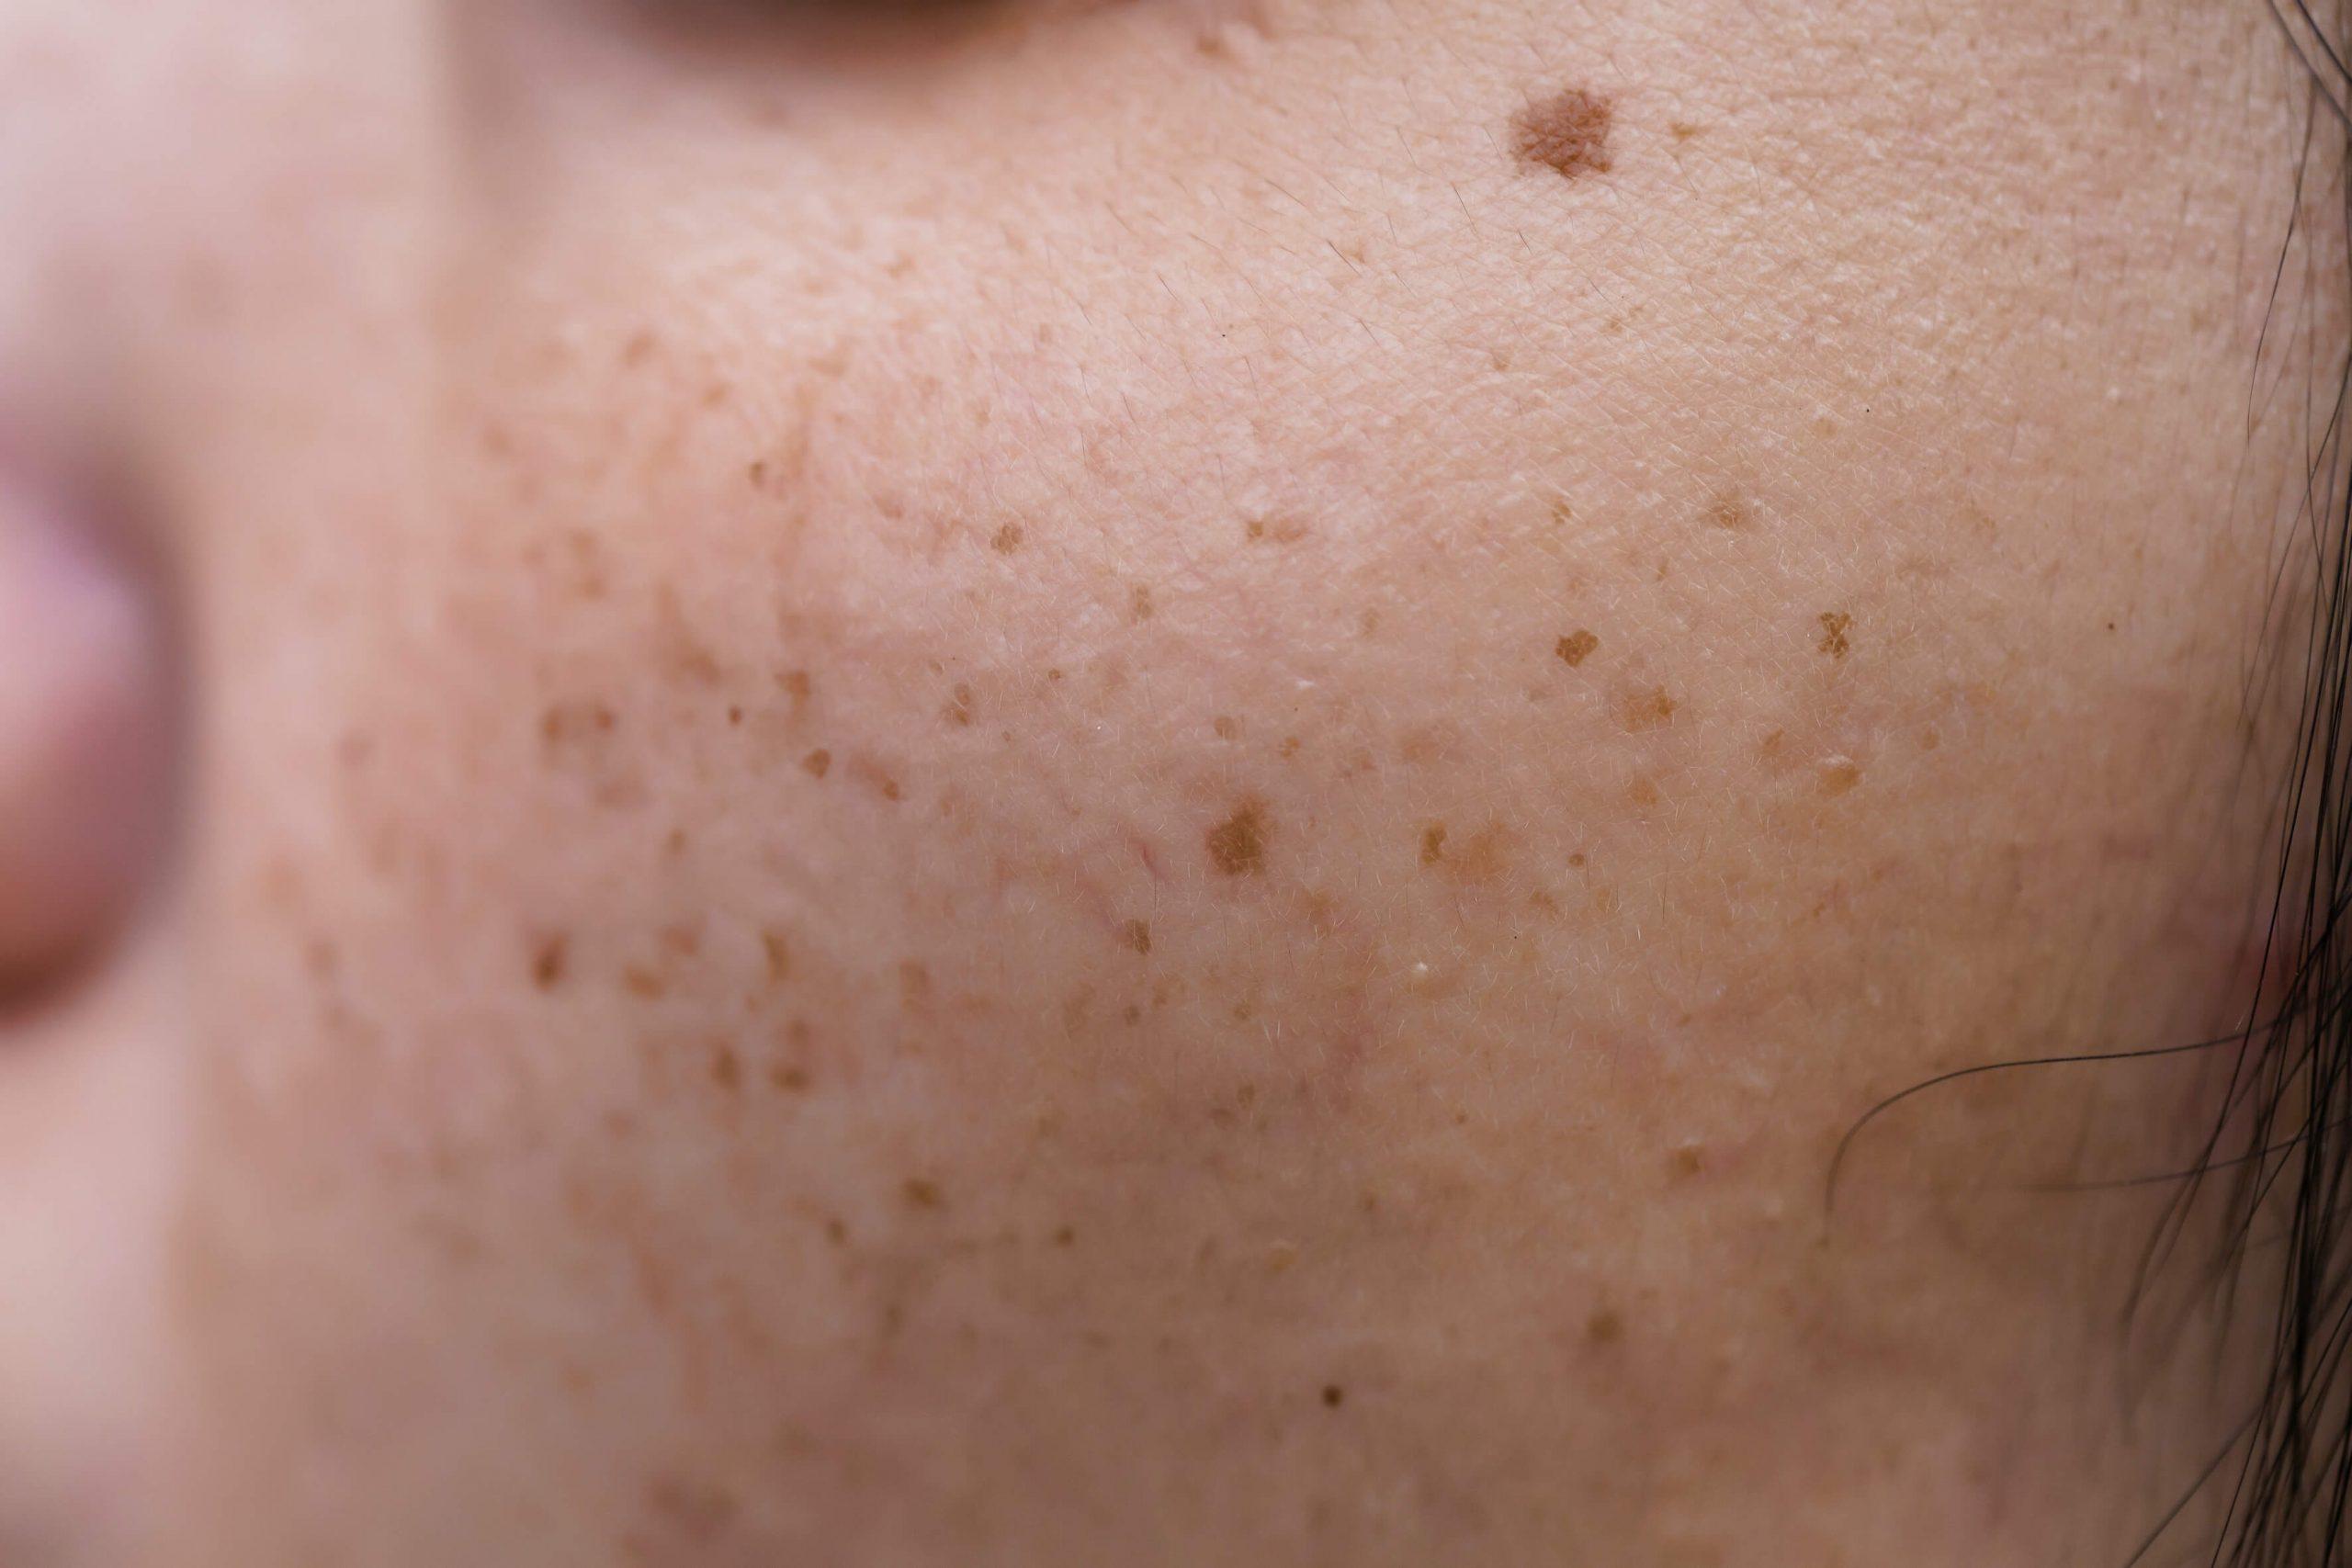 dermatologo valencia